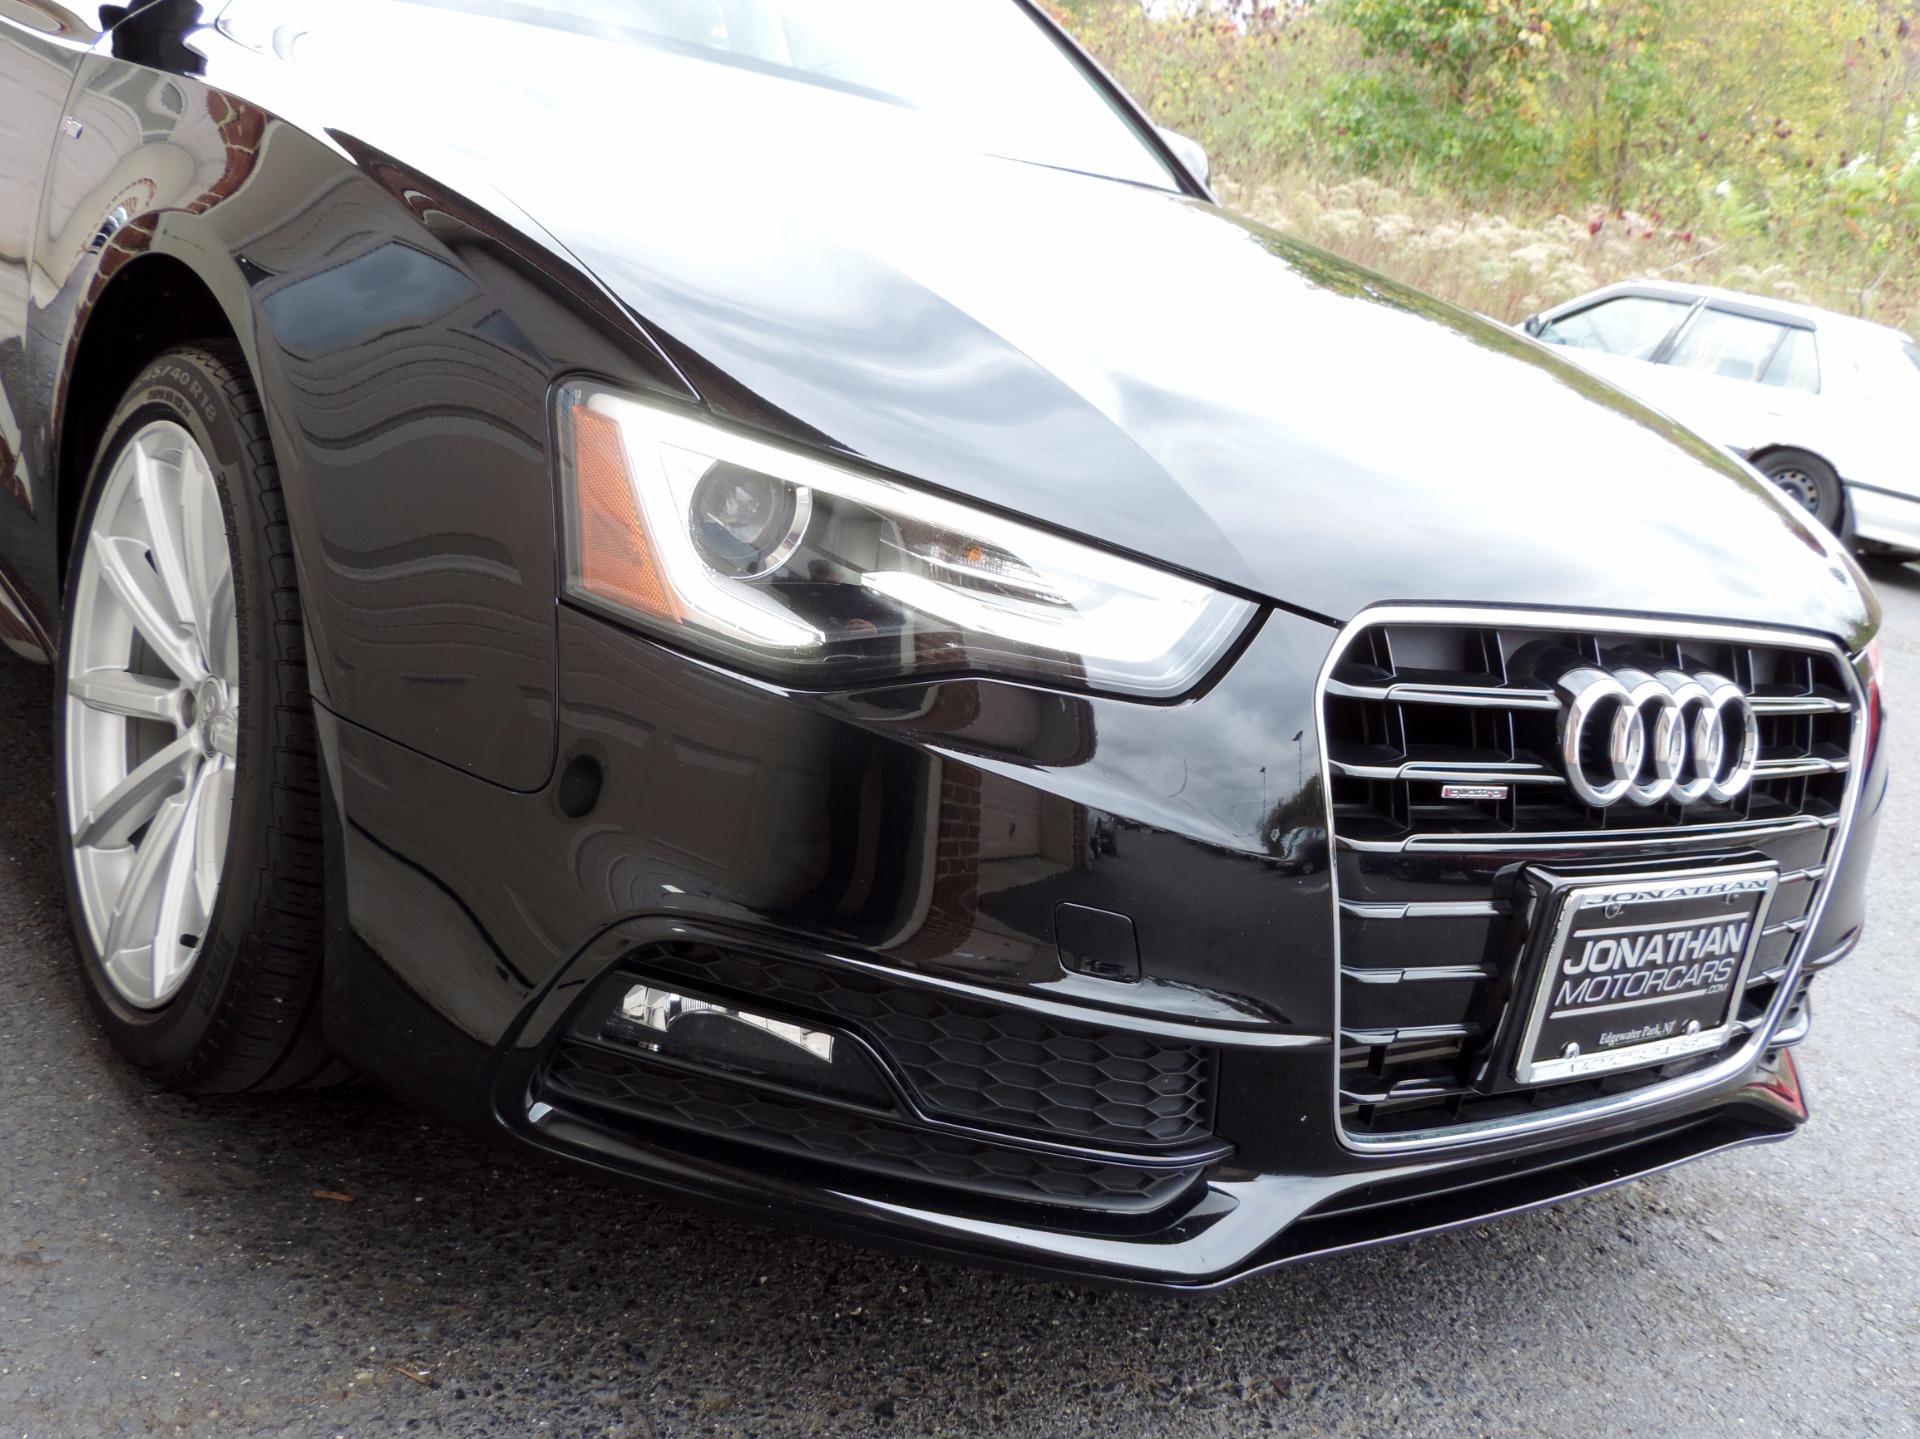 2015 Audi A5 2.0T quattro Premium Plus Stock # 017341 for sale near Edgewater Park, NJ | NJ Audi ...